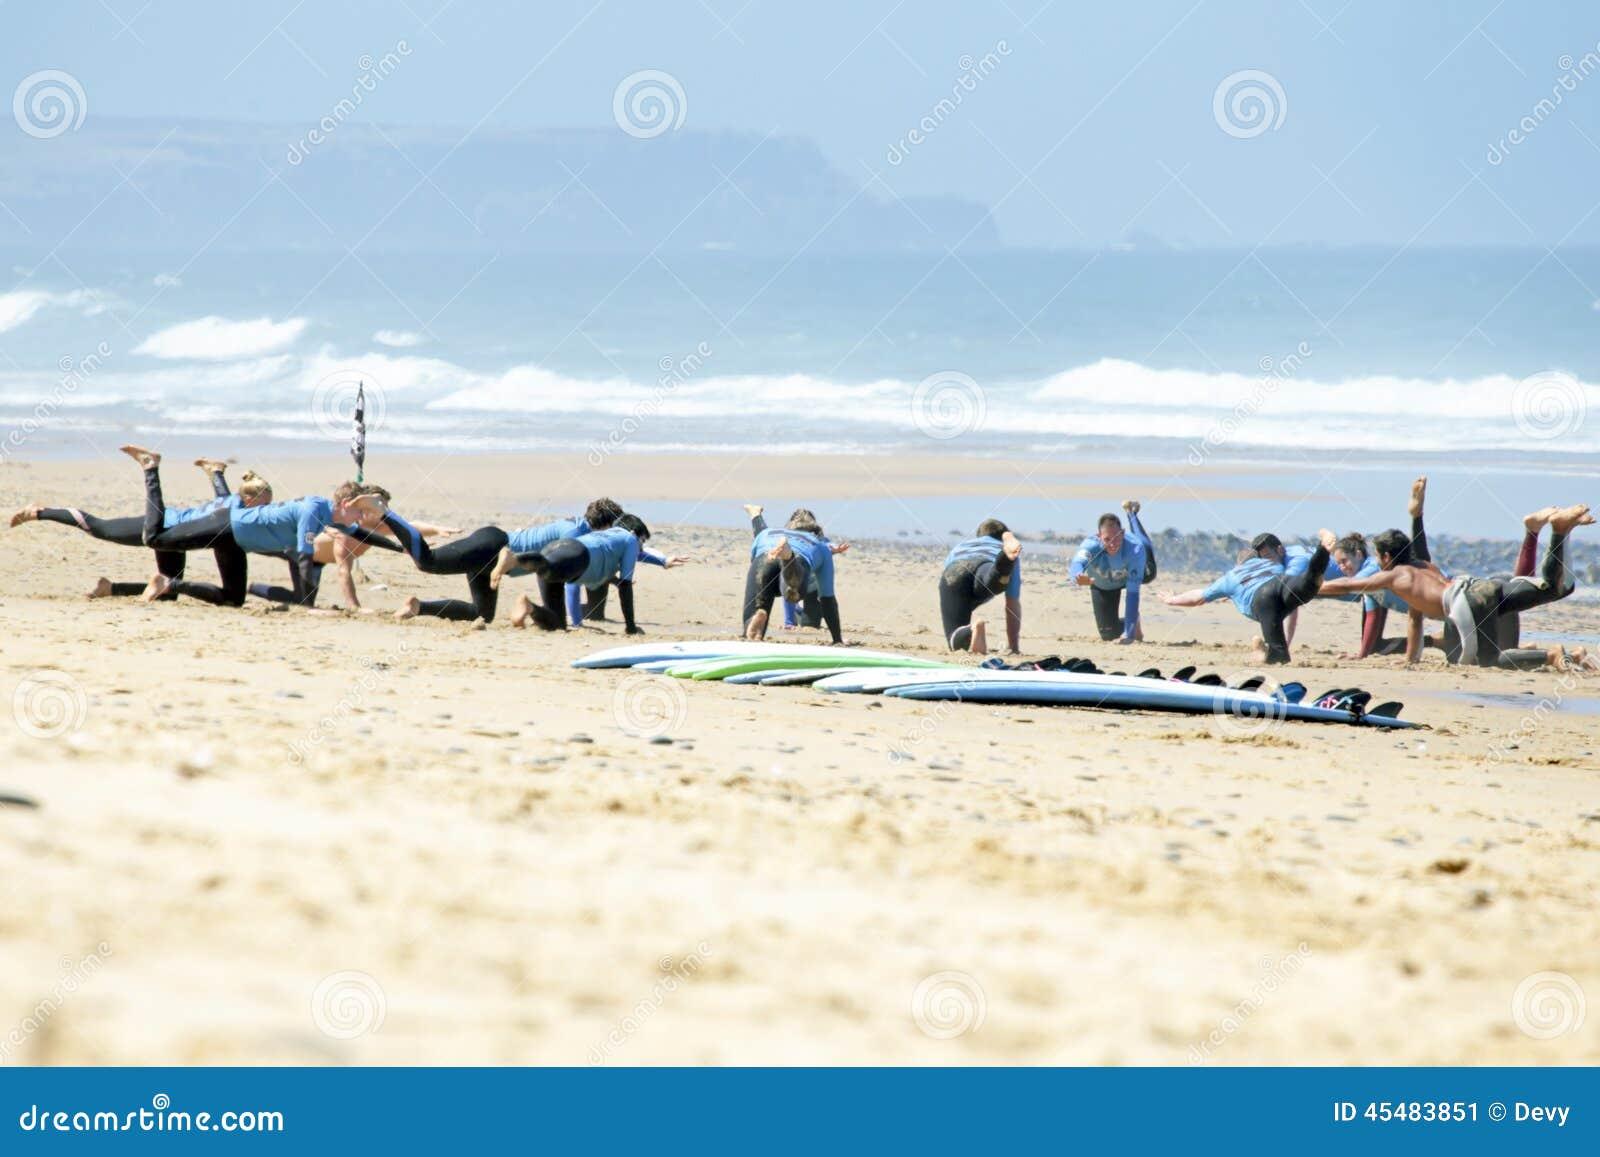 谷FIGUEIRAS,葡萄牙- 2014年8月16日:做excers的冲浪者